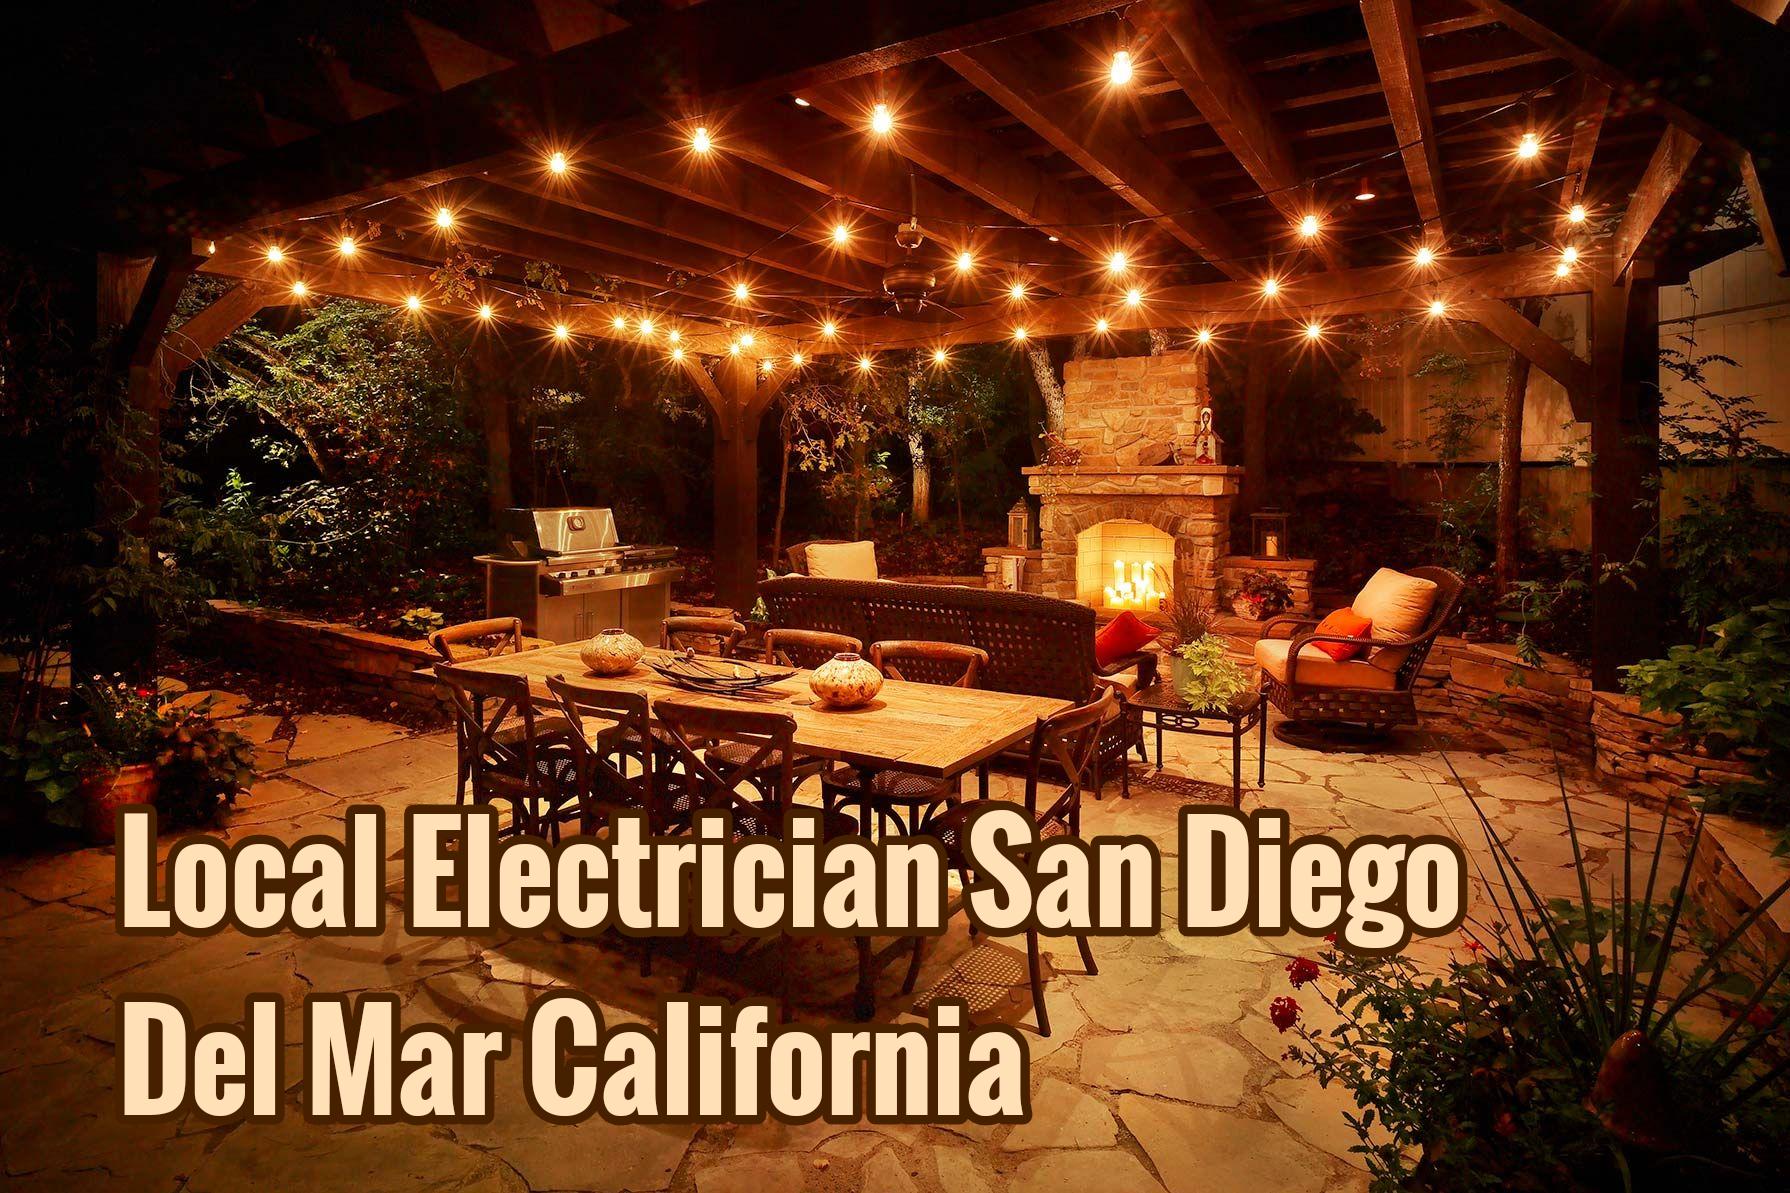 Local Electrician San Diego Del Mar California